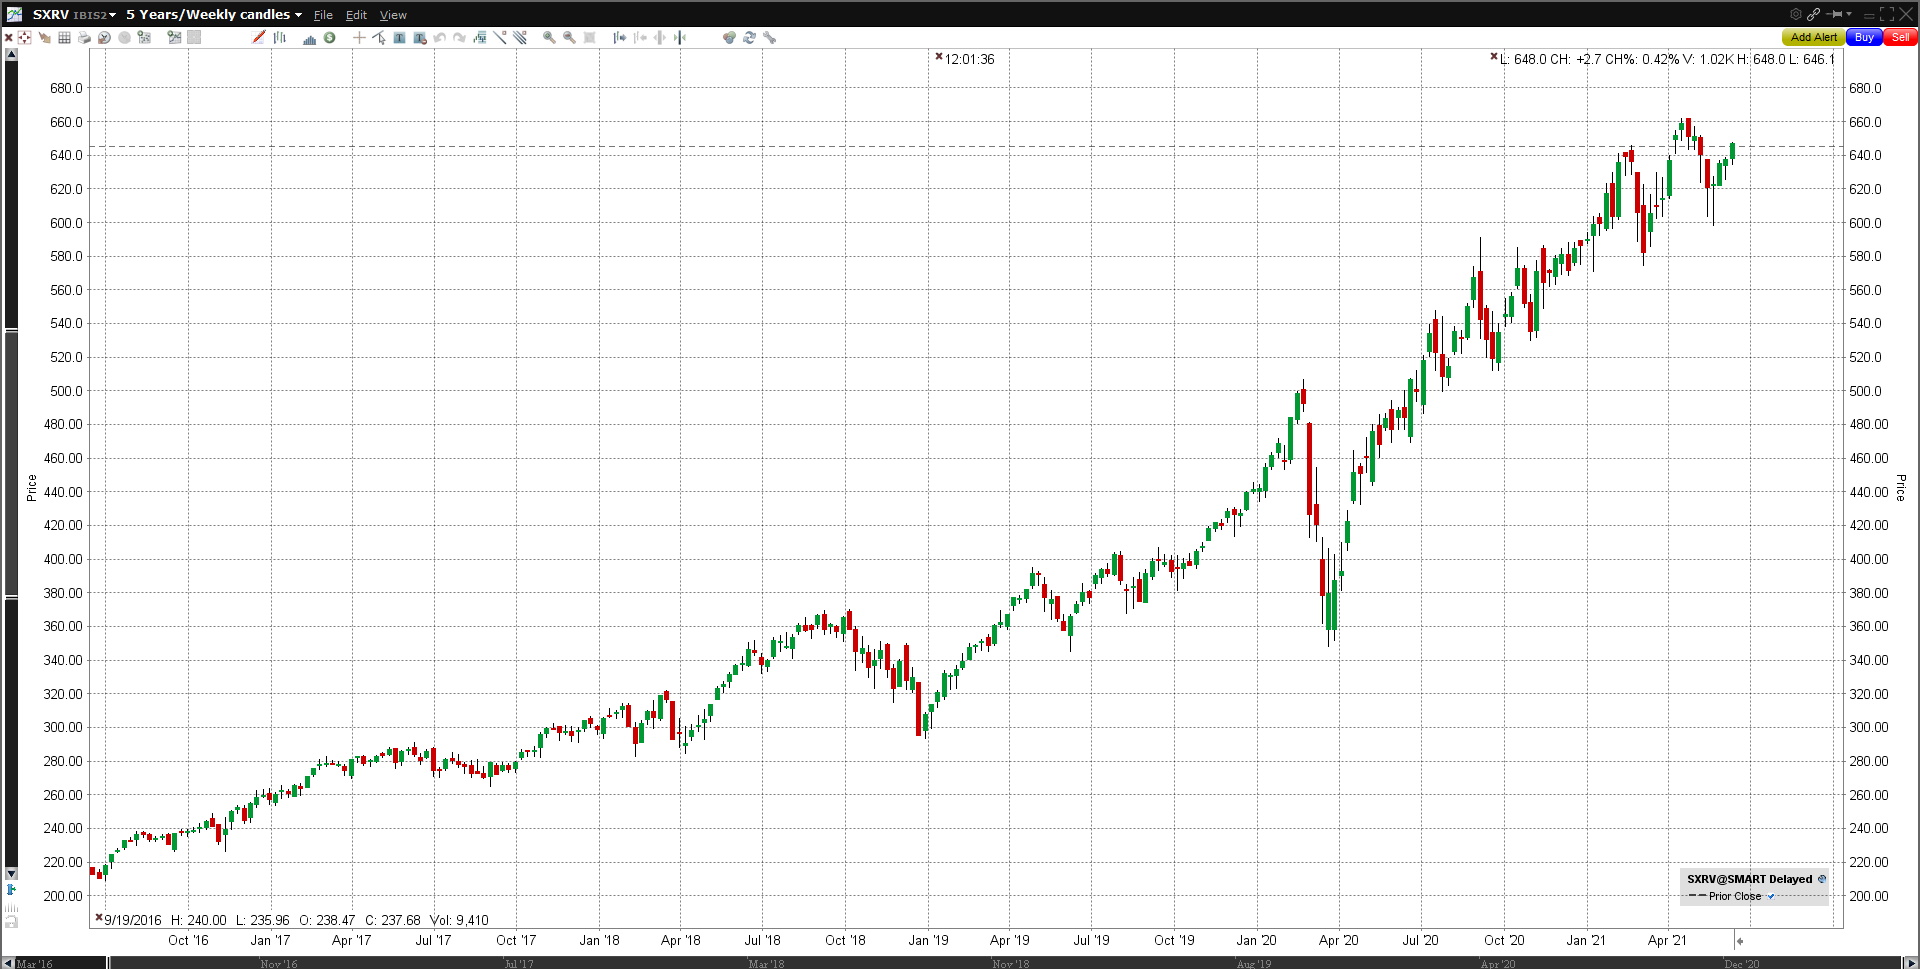 Beste ETF 2021 - iShares NASDAQ 100 UCITS ETF (SXRV)